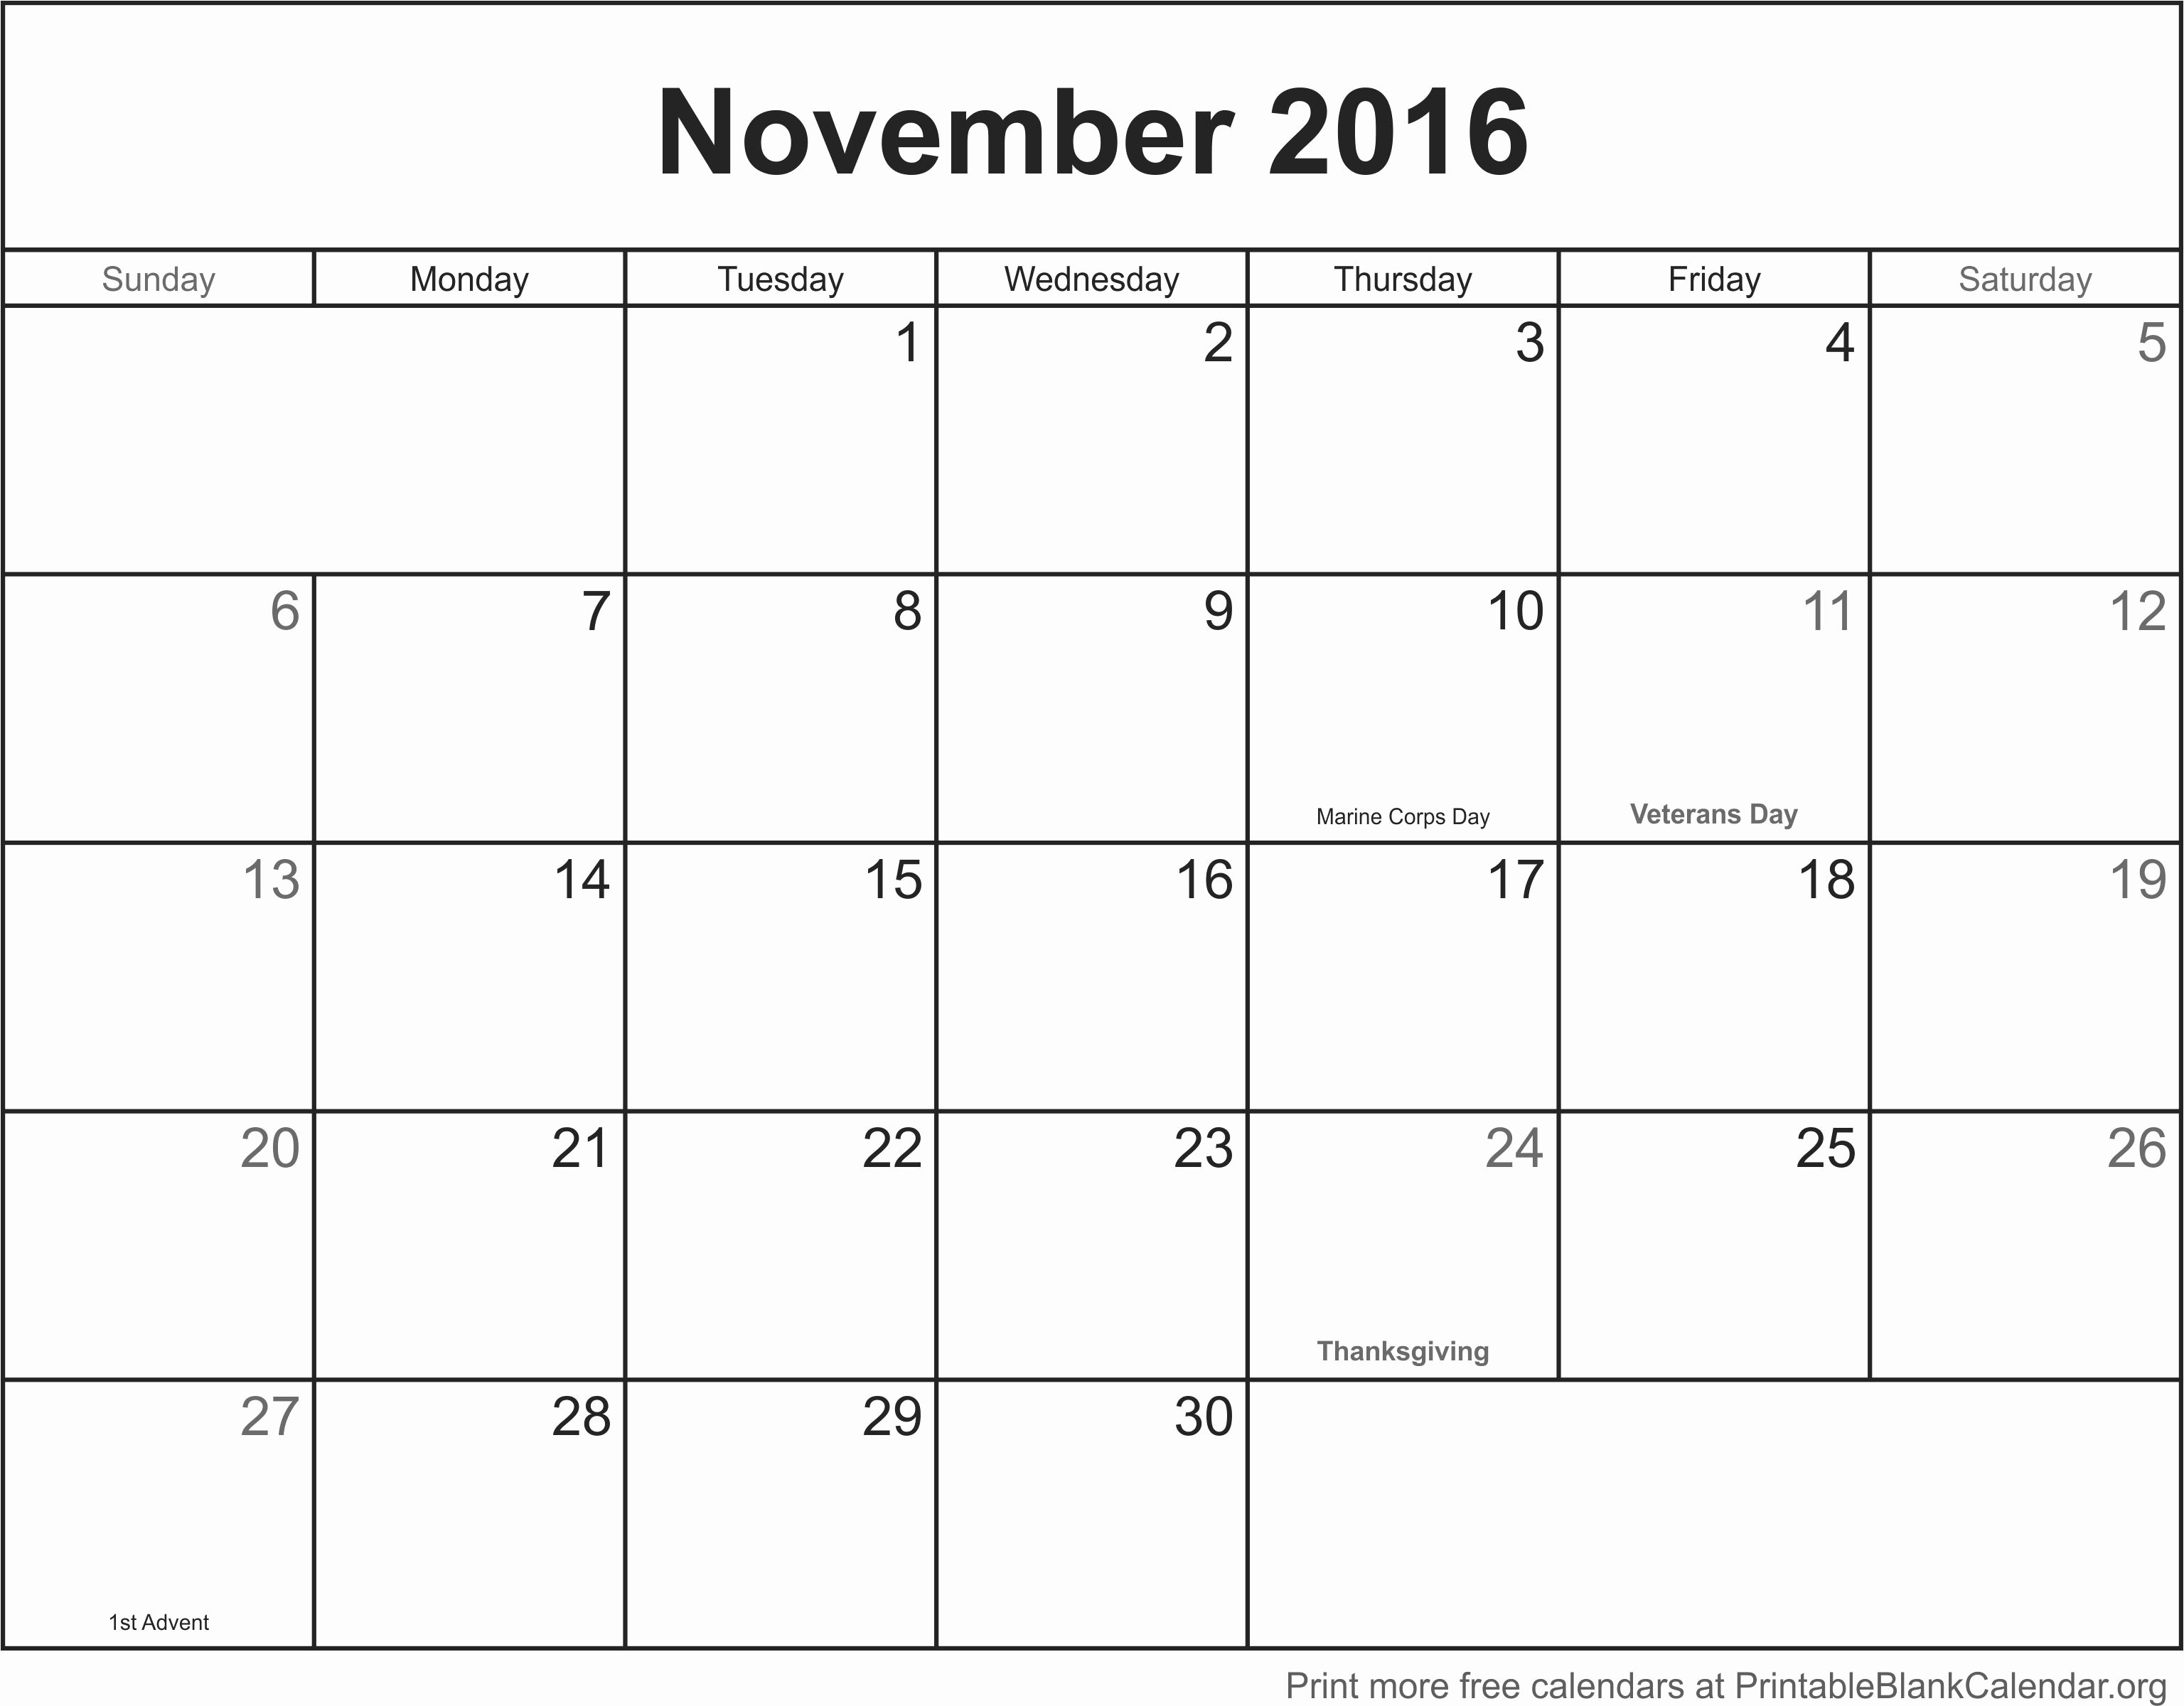 Blank Calendar Template 2016 Luxury November 2016 Printable Blank Calendar Printable Blank